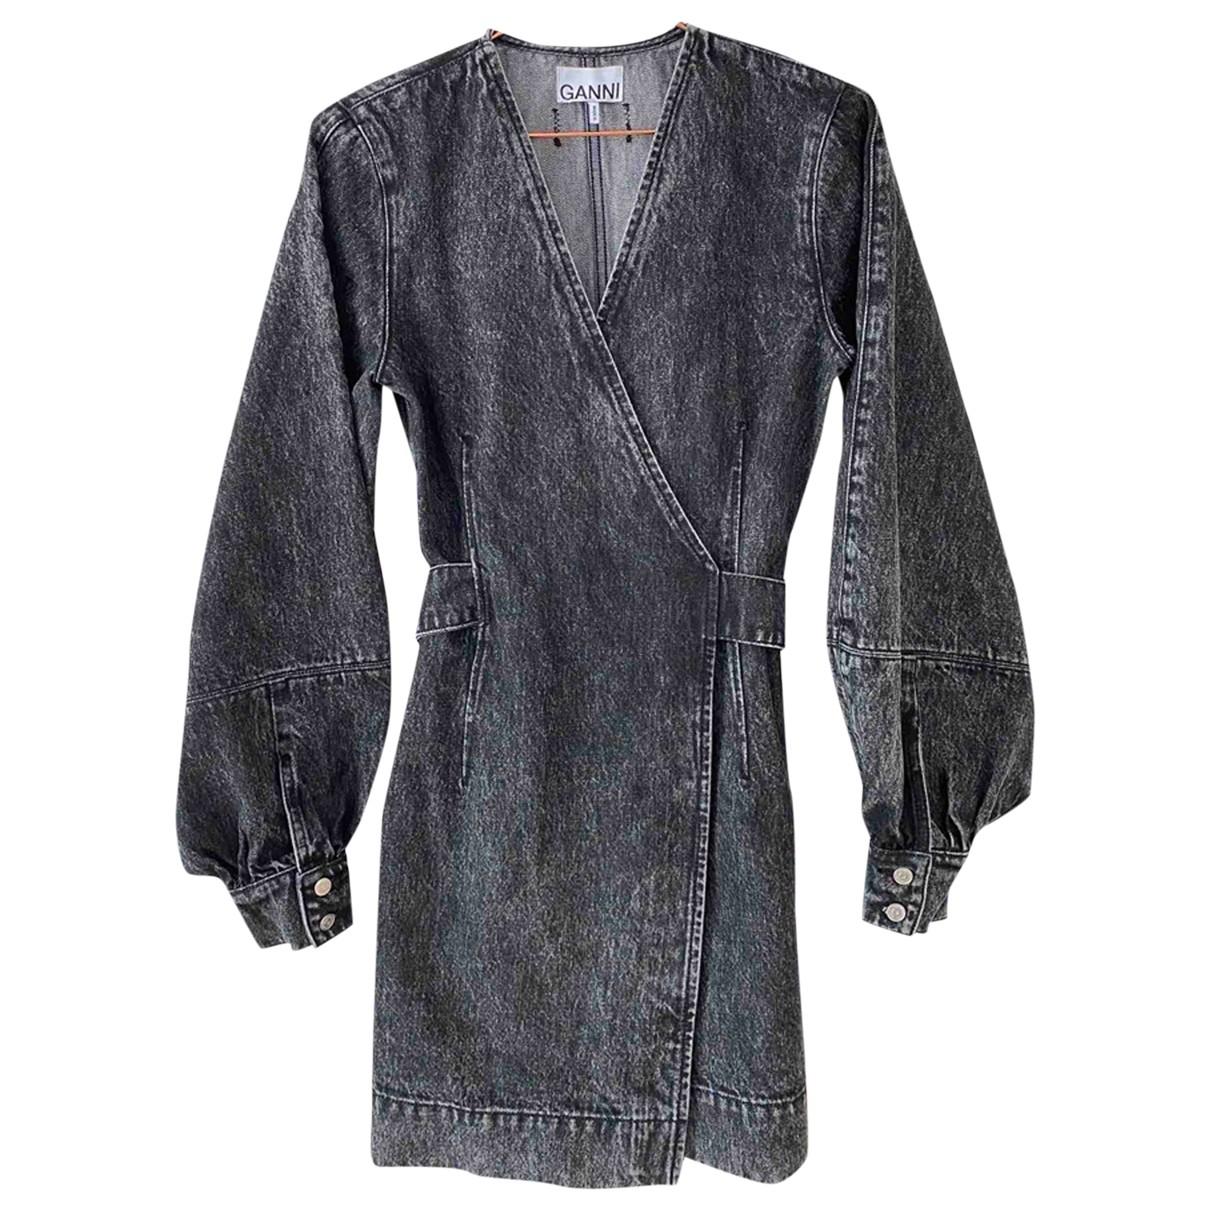 Ganni Spring Summer 2020 Grey Cotton dress for Women S International